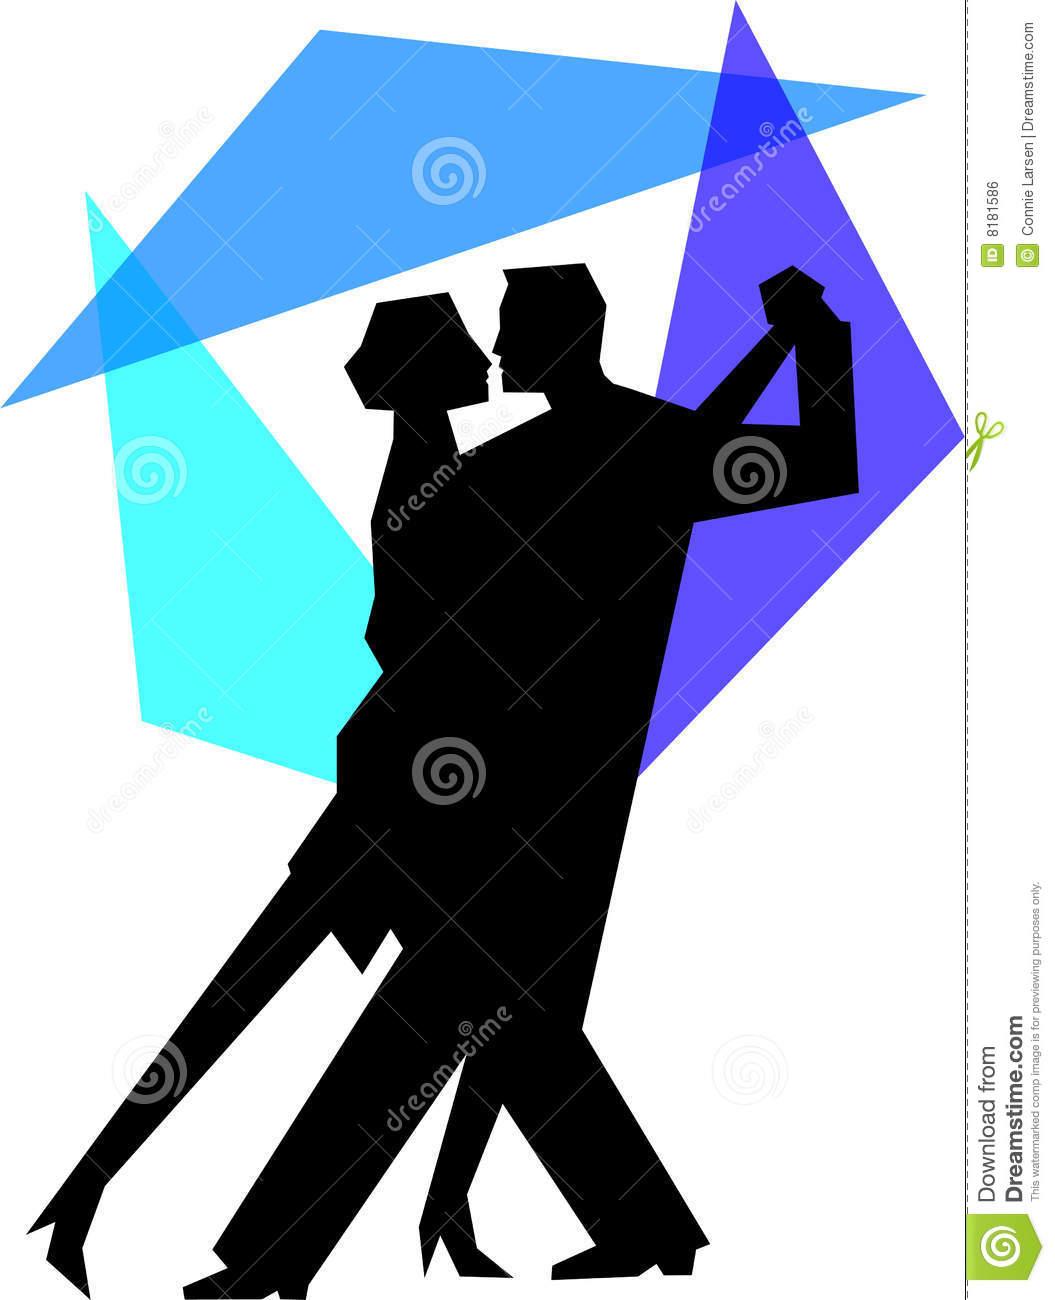 Blue Tango Dance Couple/eps Royalty Free Stock Image.